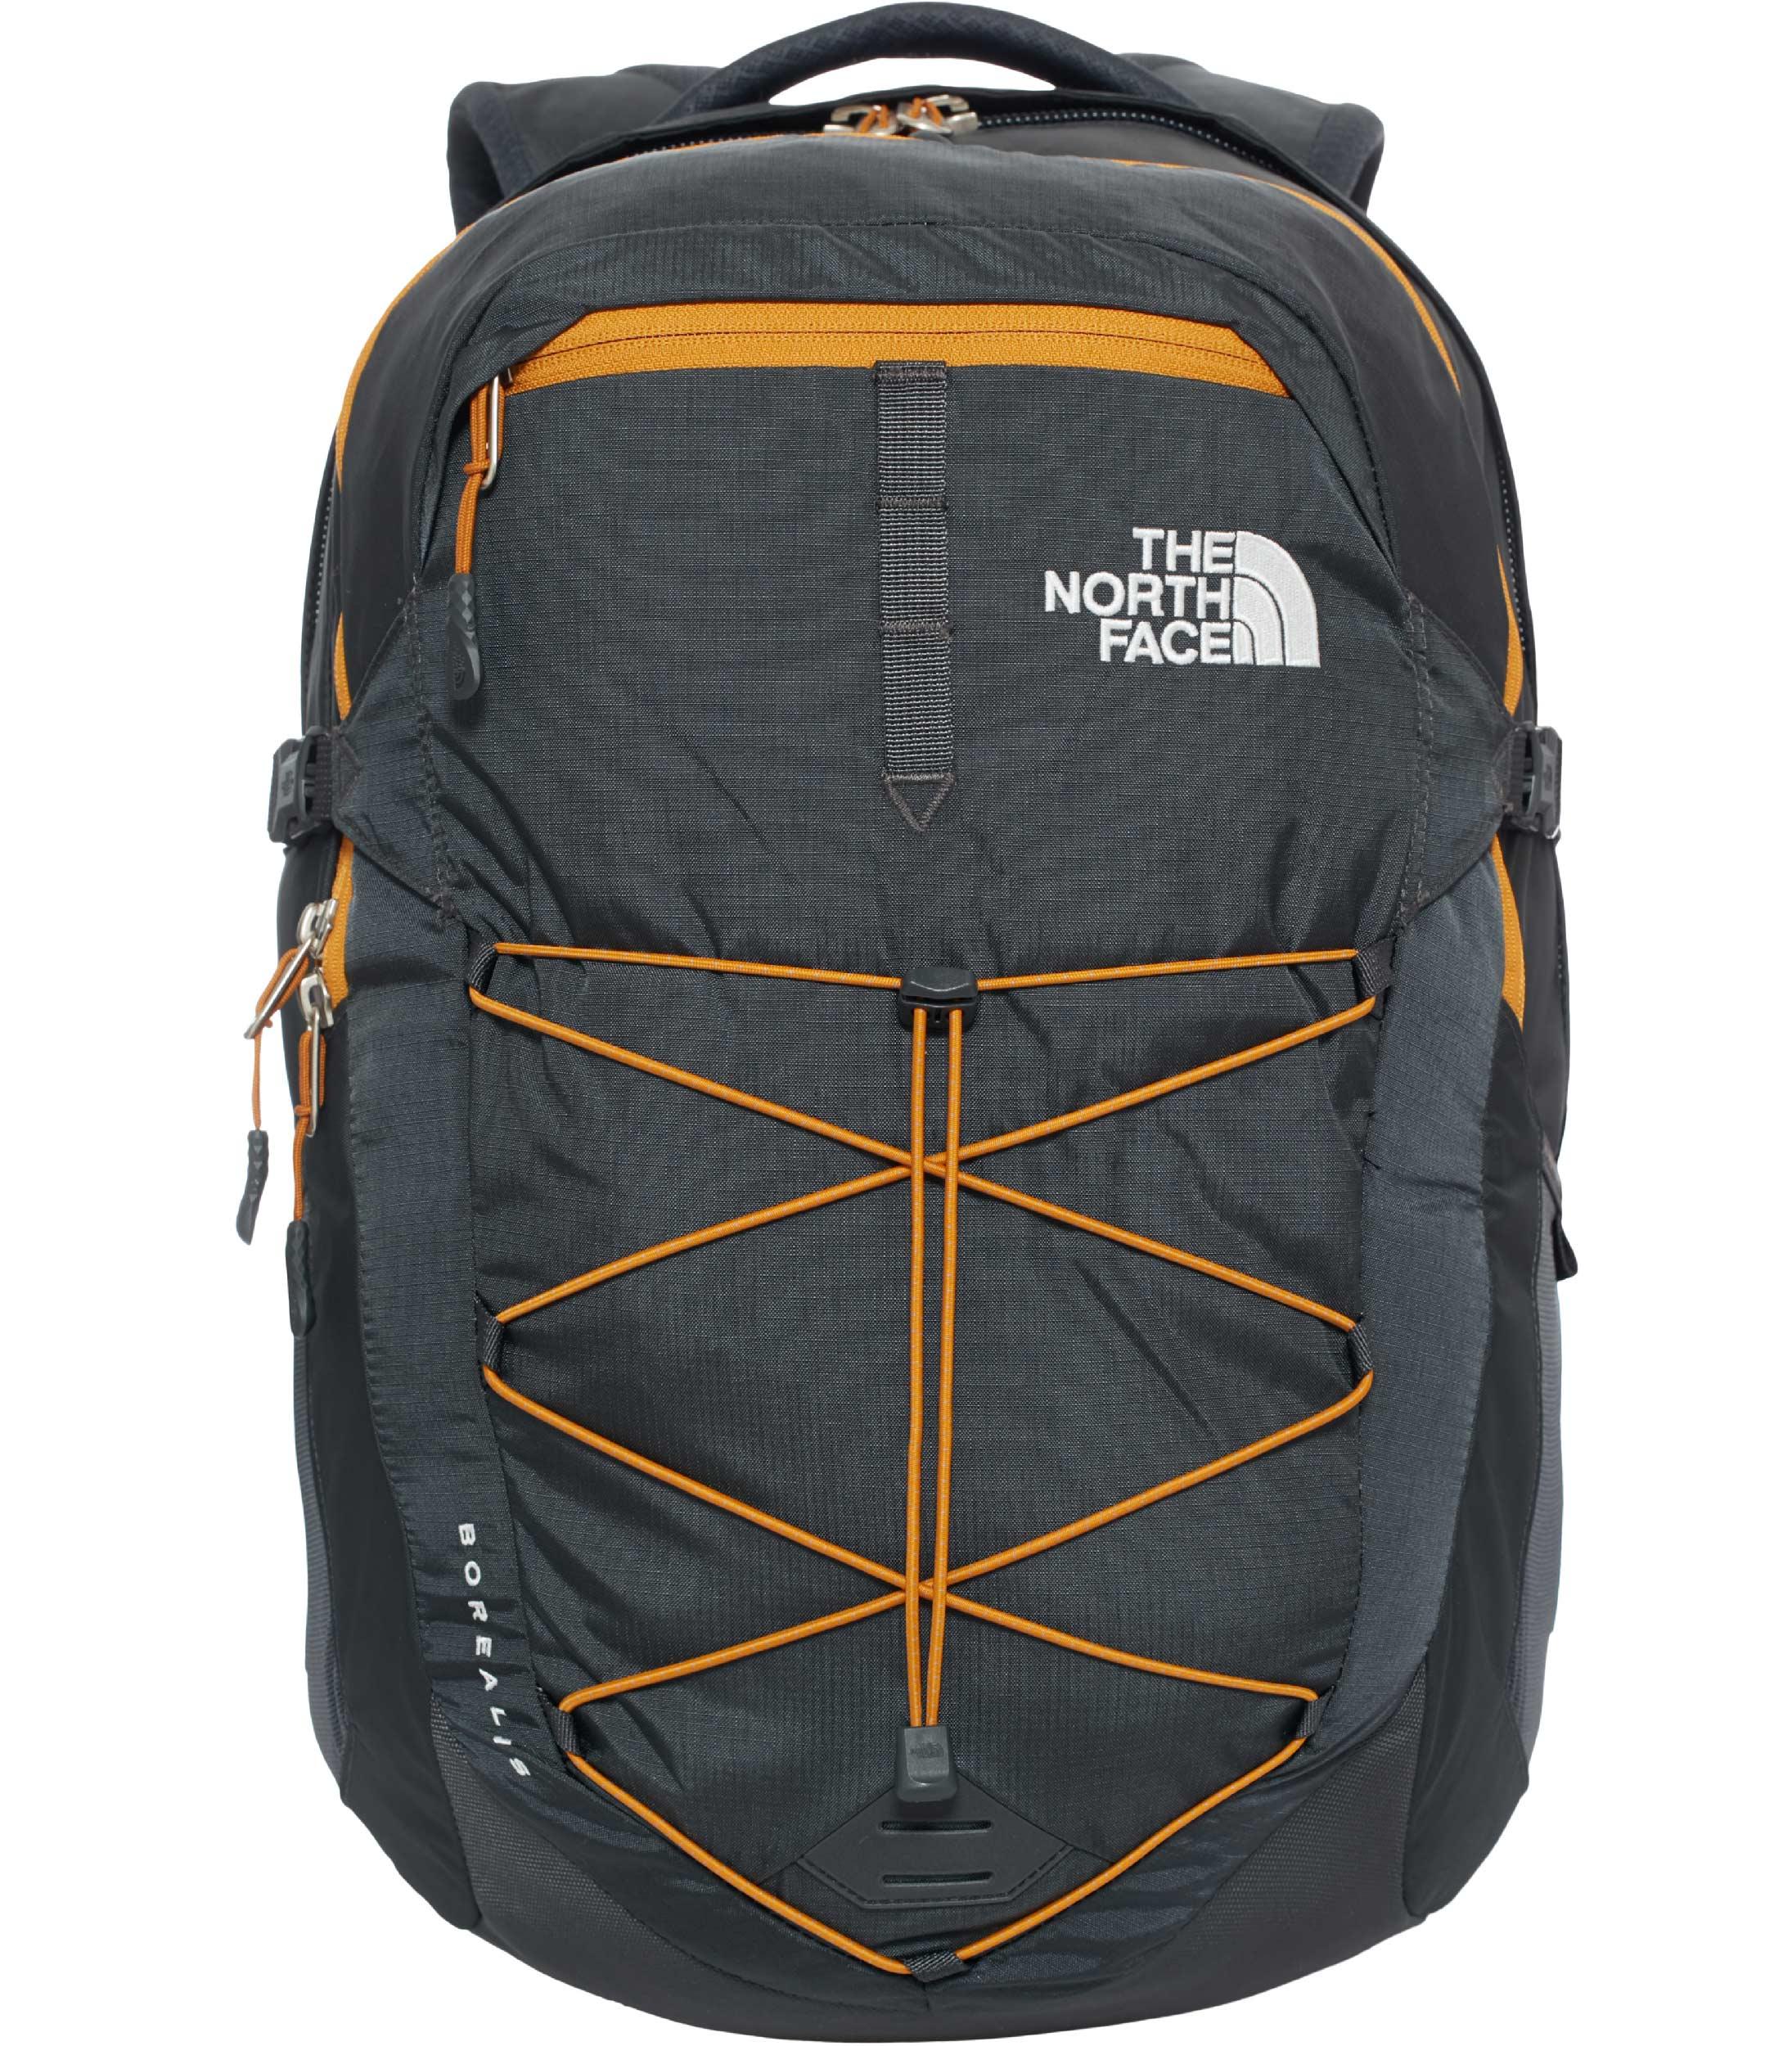 776d19432b3 The North Face Borealis - Rugzakken - Bags & Packs